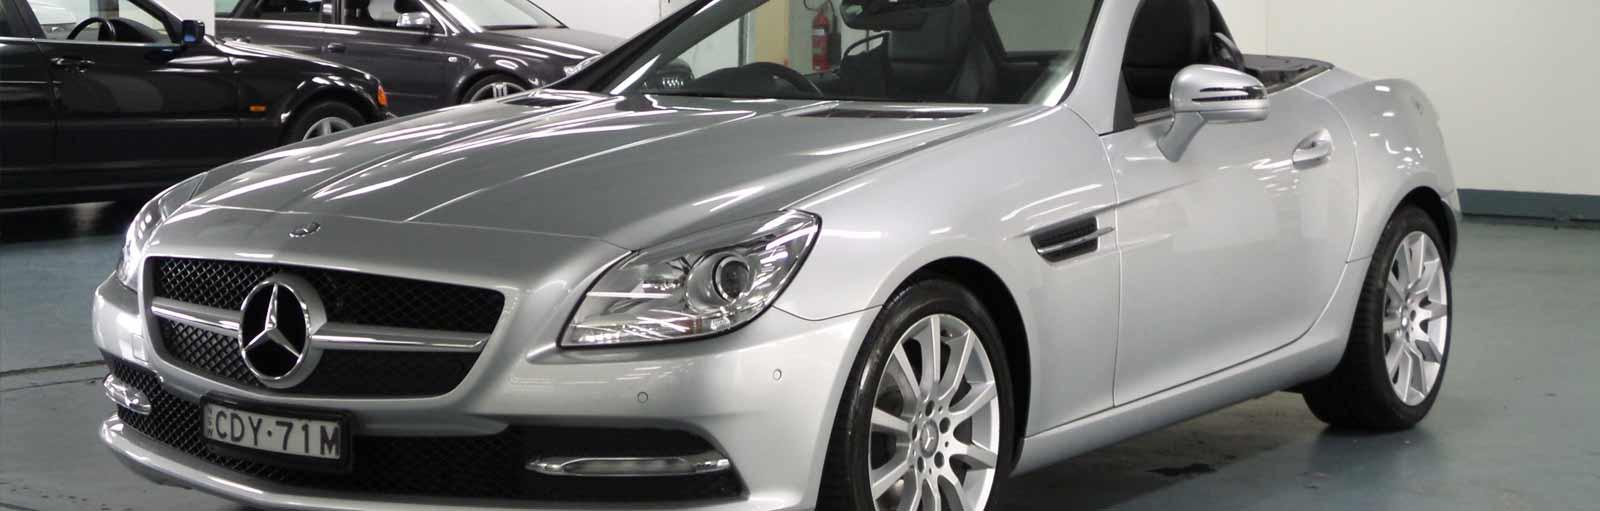 buy cheaper prestige cars in sydney at prestige direct. Black Bedroom Furniture Sets. Home Design Ideas